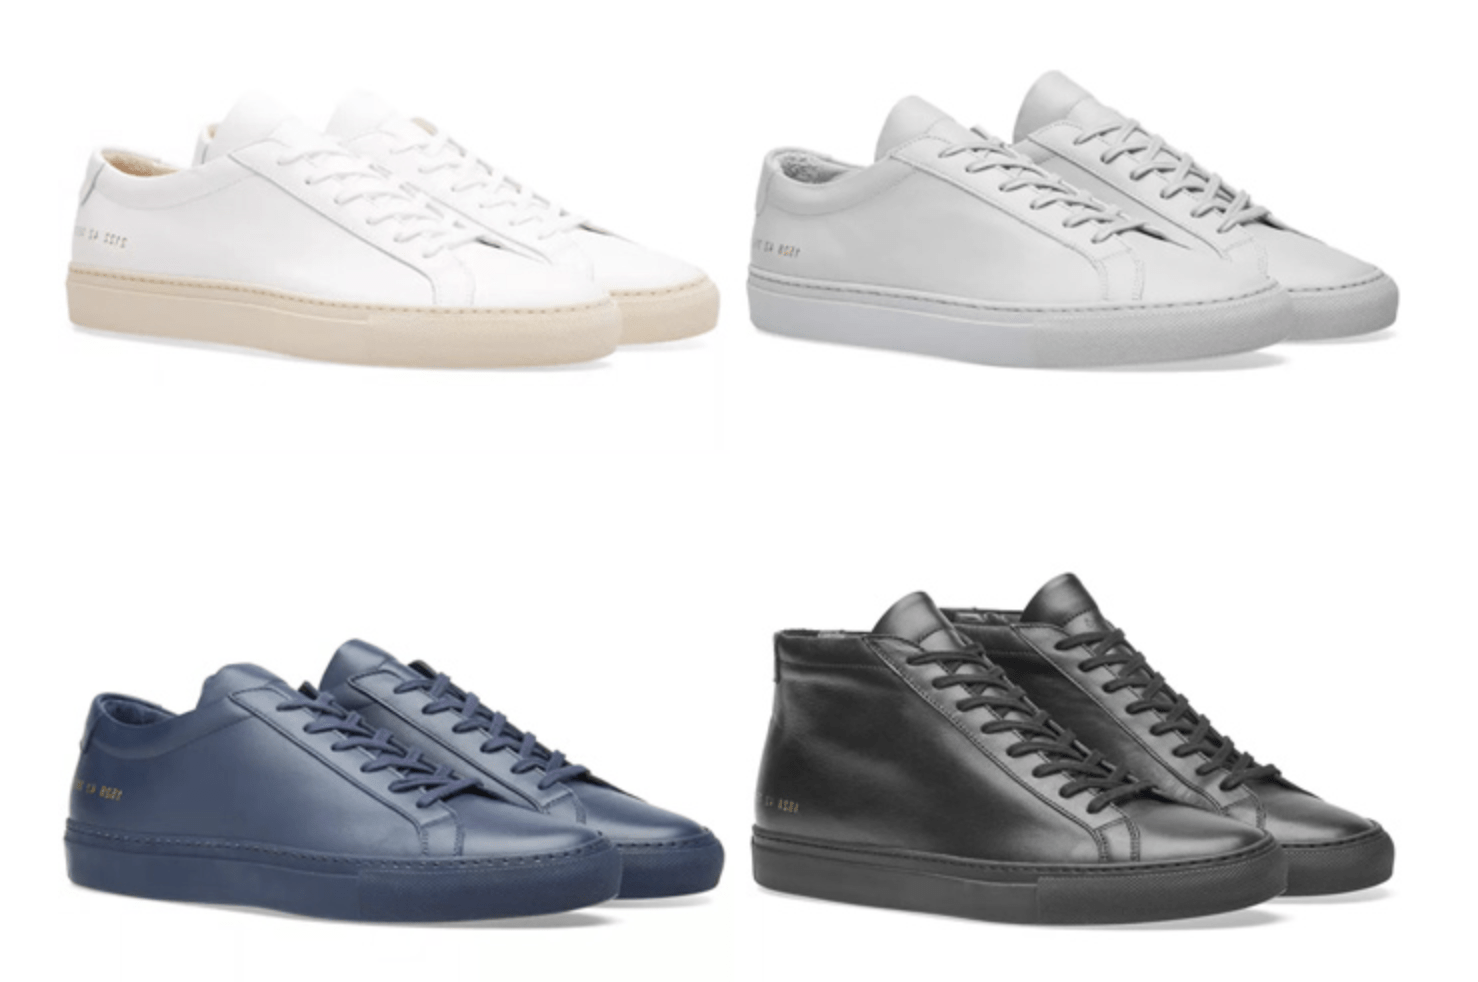 Sepatu Luxury Sneakers Common Project Terbaik luxury sneakers - 14 Luxury Sneakers Terbaik dari Desainer Dunia